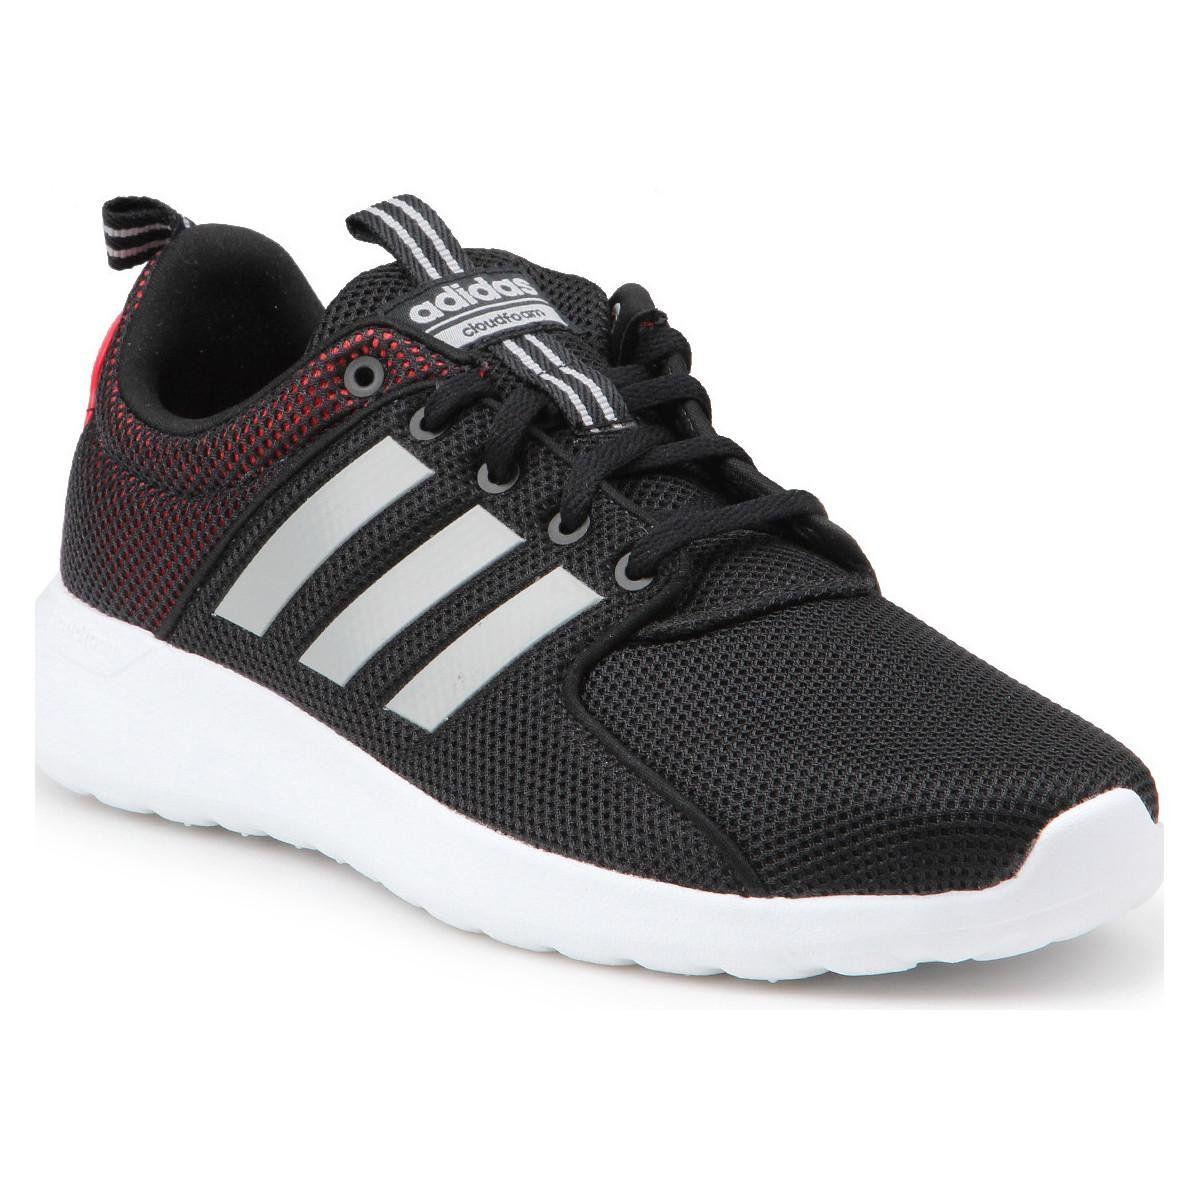 Tenis Adidas Lite Racer - B42183